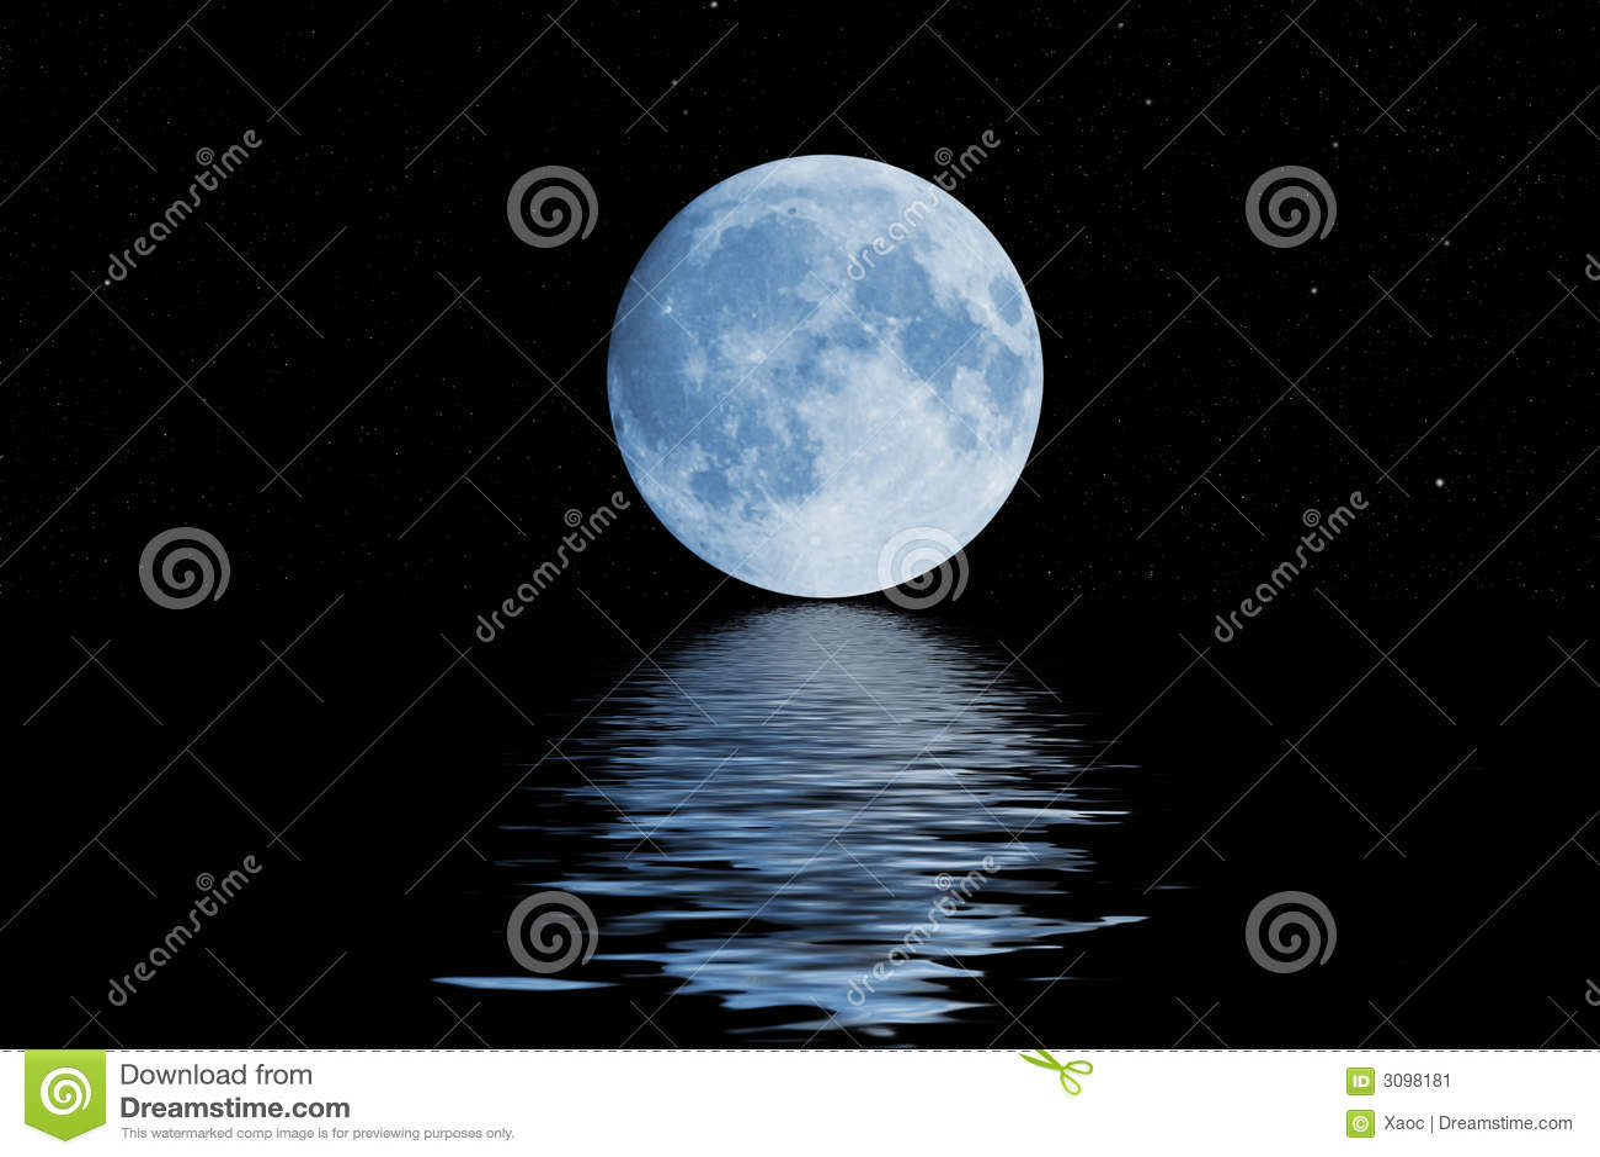 Blue Moon dating agency Viele Fischdatieragentur uk